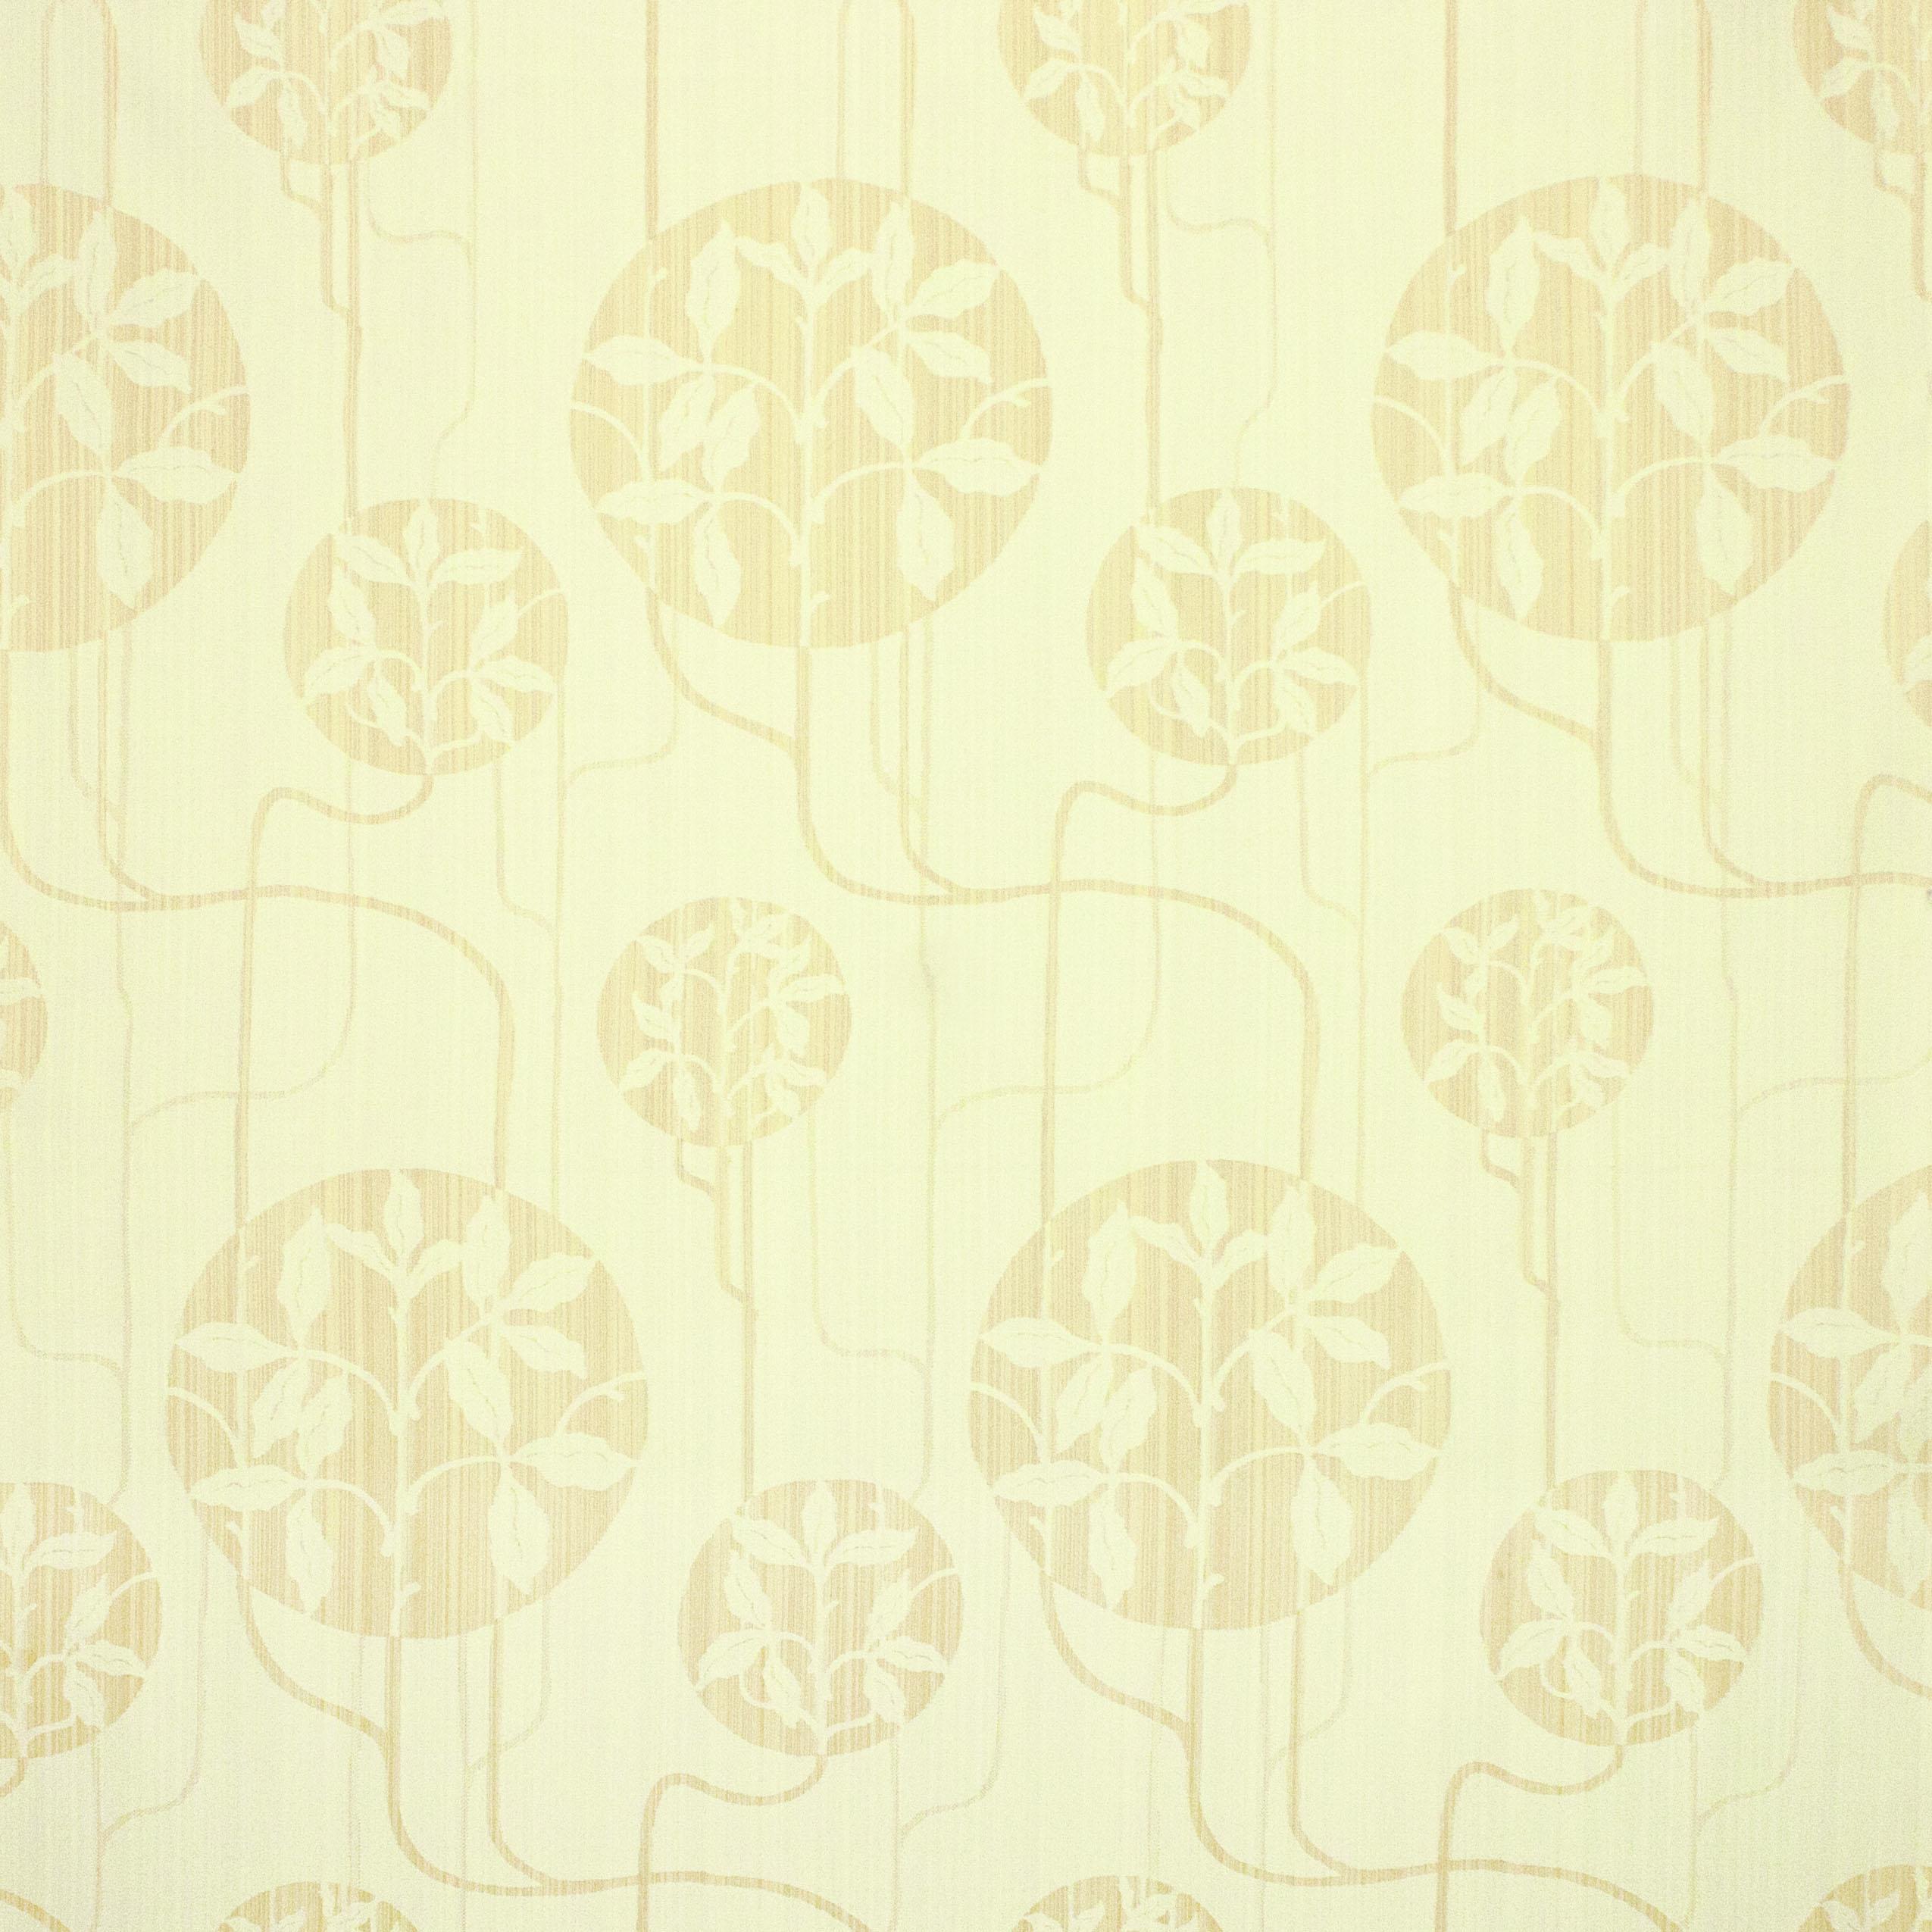 Leafdrops-Beige